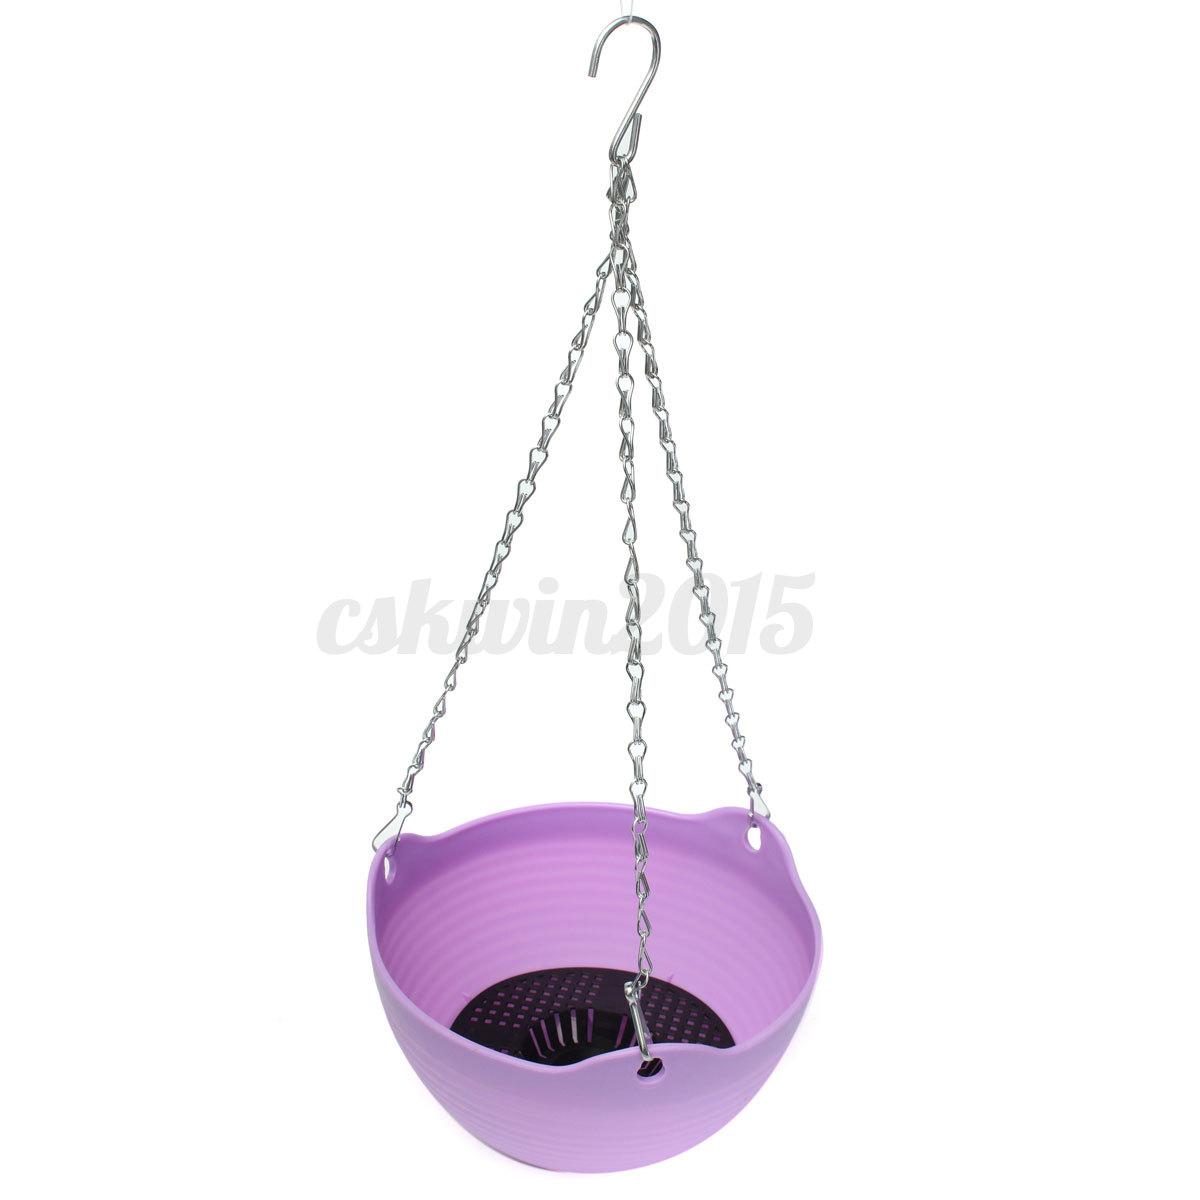 blumentopf blumenk bel h ngetopf pflanztopf bertopf balkon h ngen kunststoff ebay. Black Bedroom Furniture Sets. Home Design Ideas